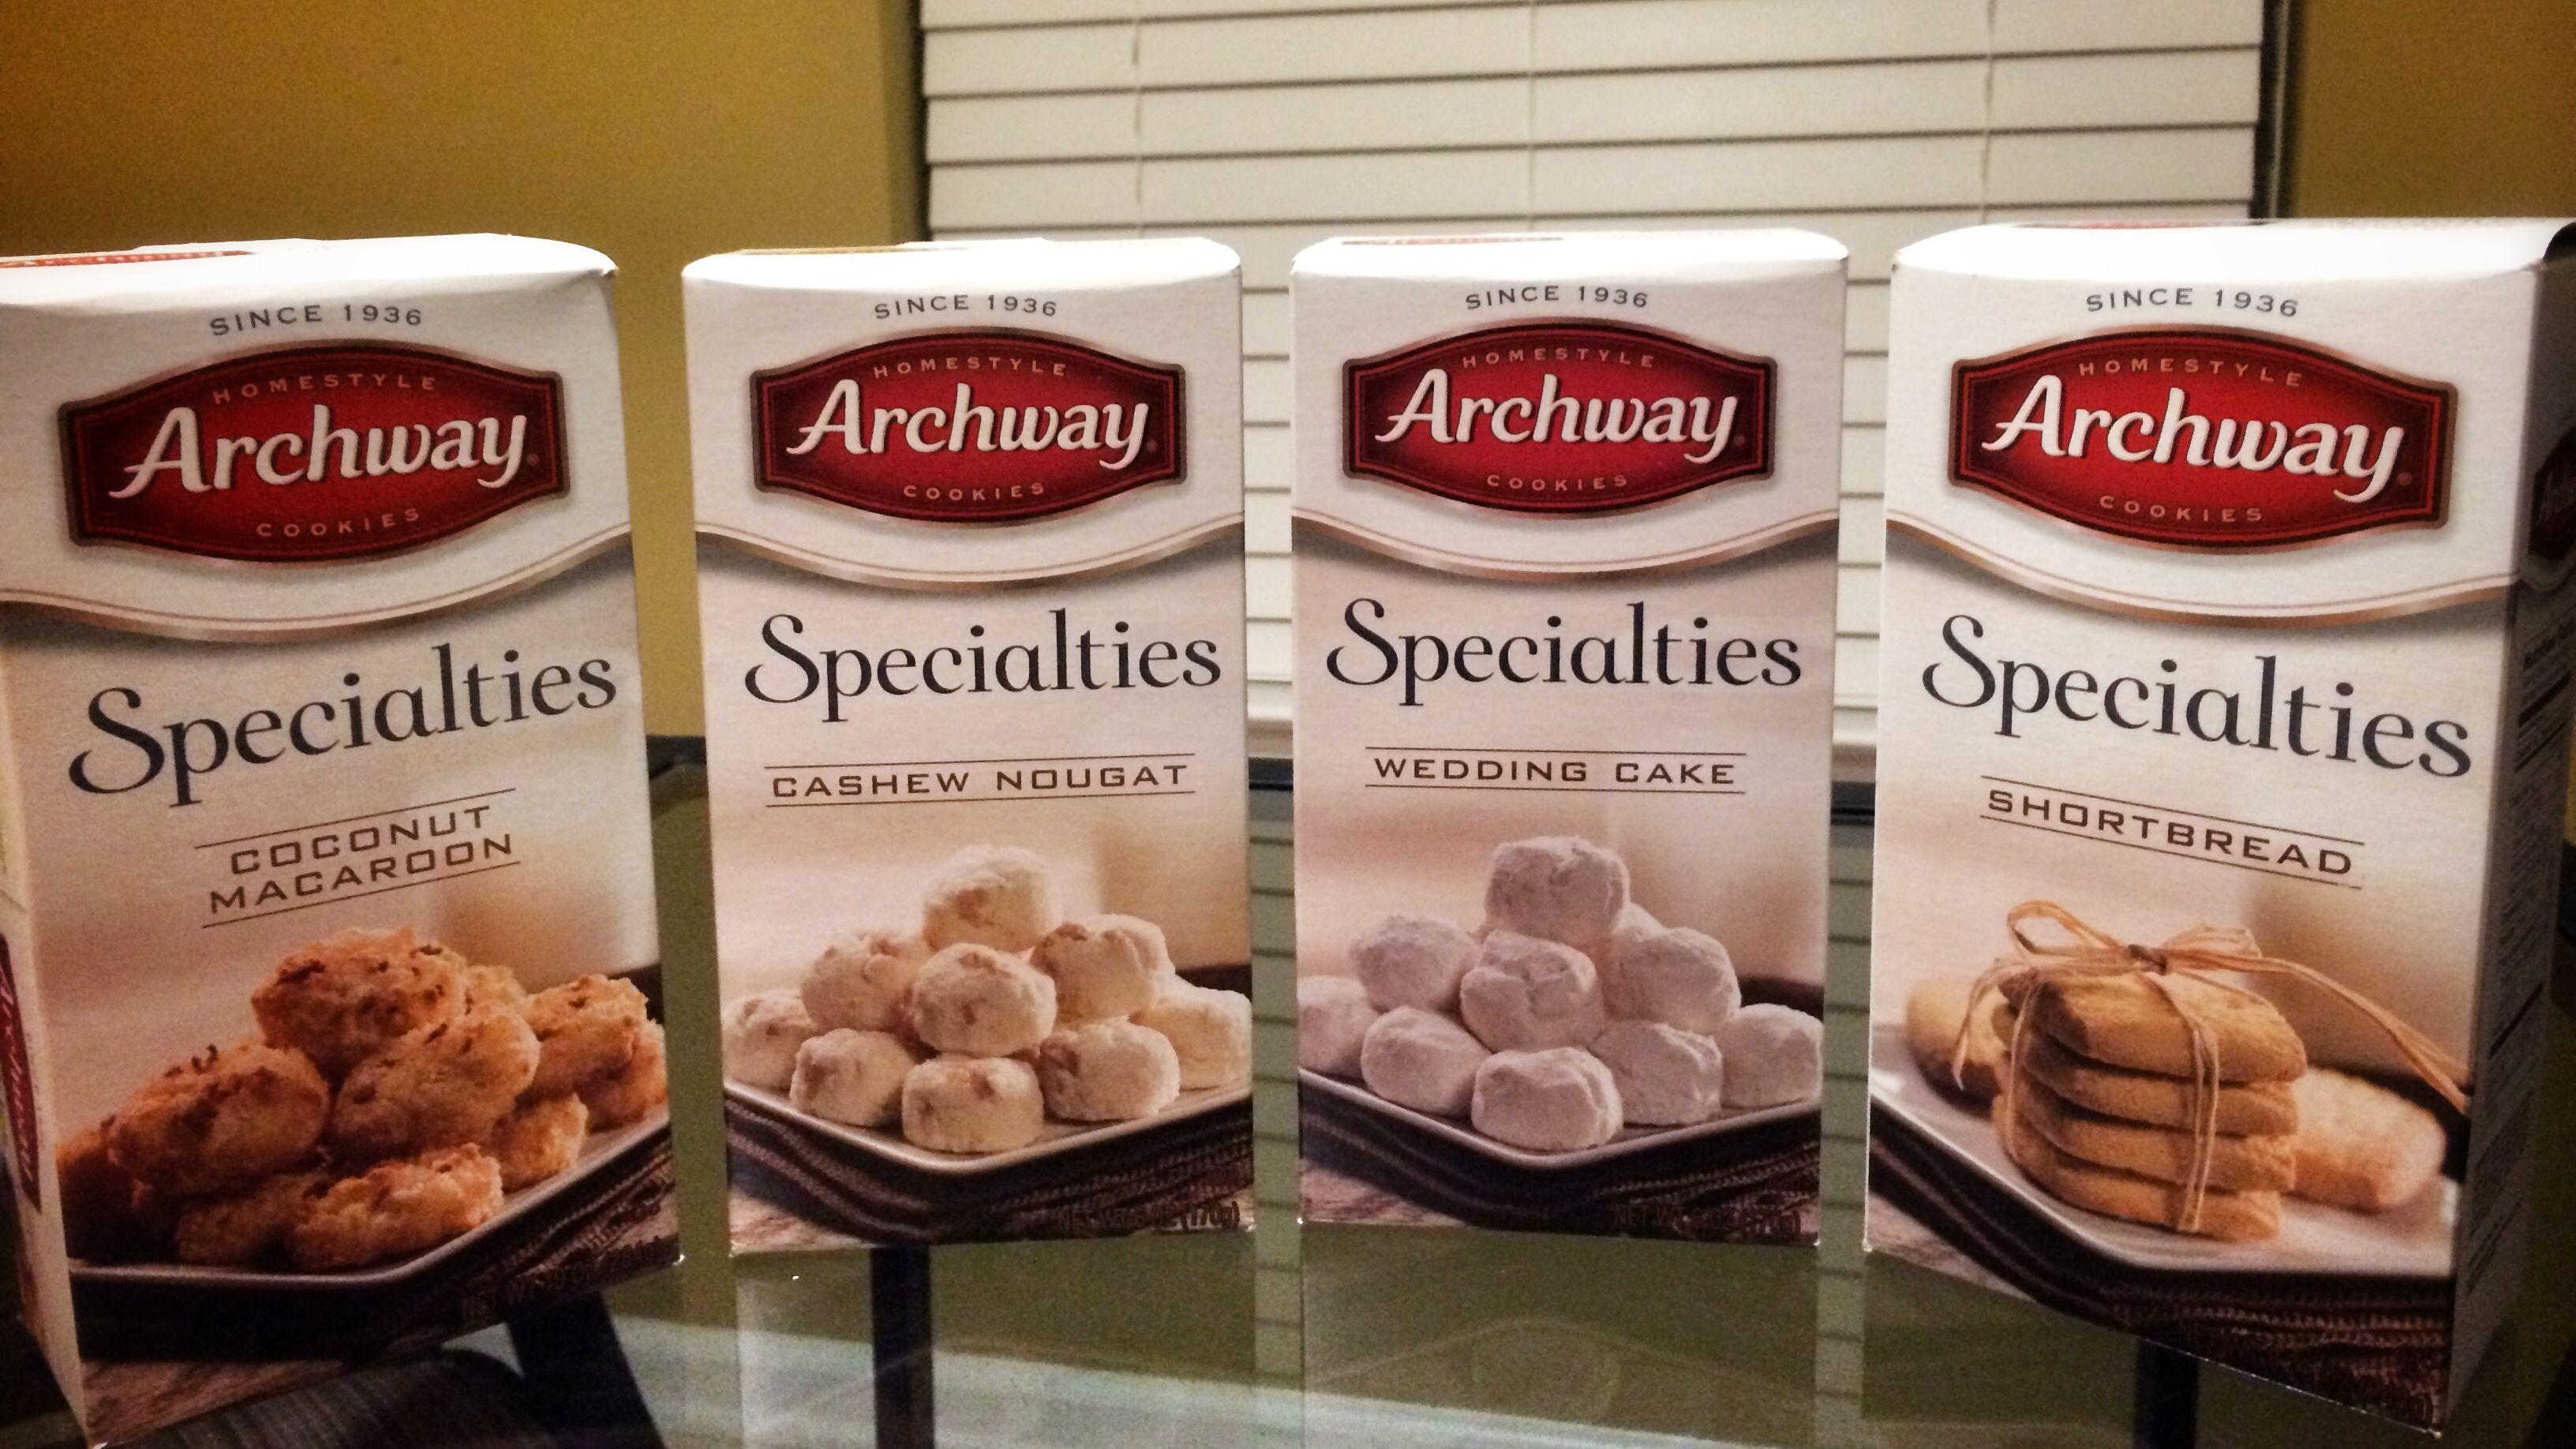 Archway Specialties Wedding Cake Cookies